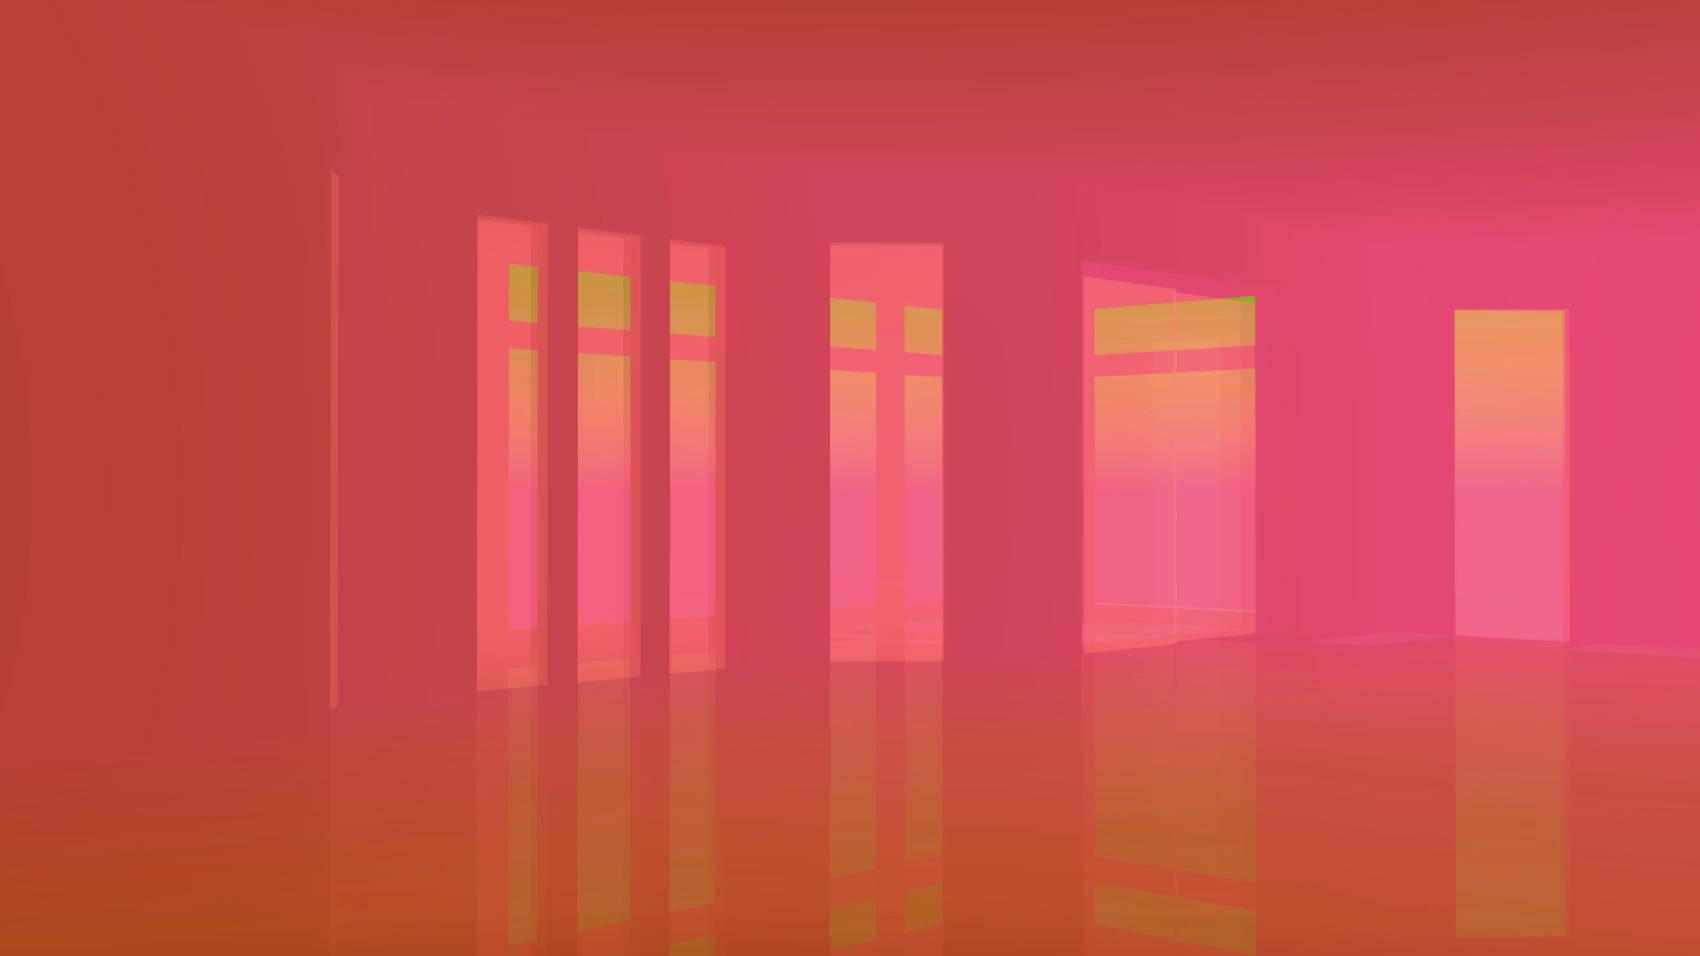 Brick Red Room, 2017, Jet d'encre, 77 x 137 cm